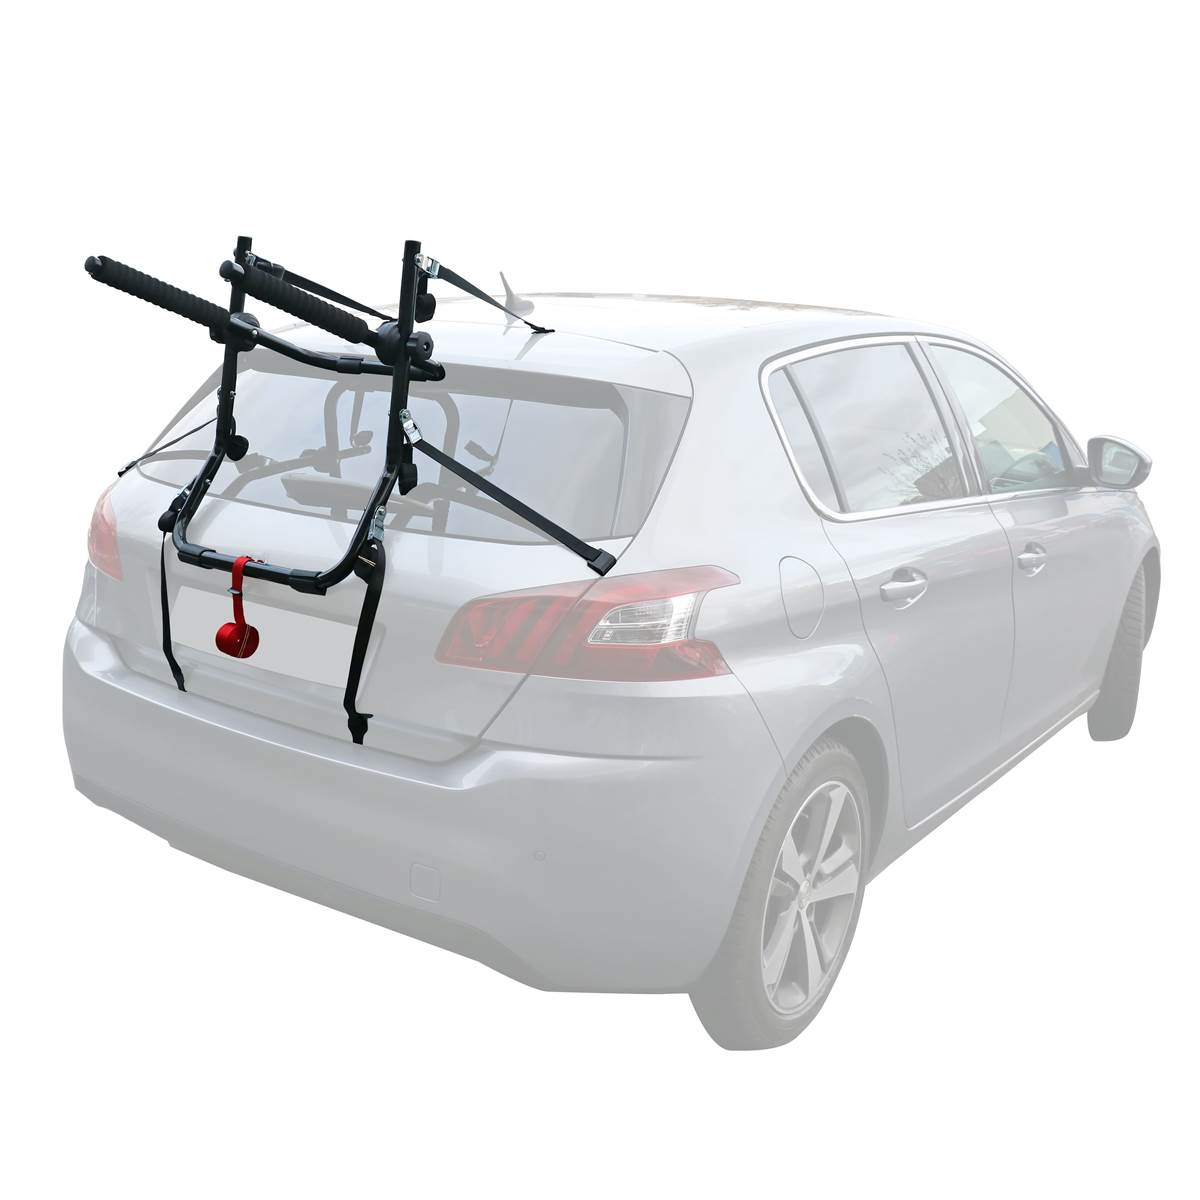 Porte-vélos à sangles Contact Cargo 3 pour 3 vélos